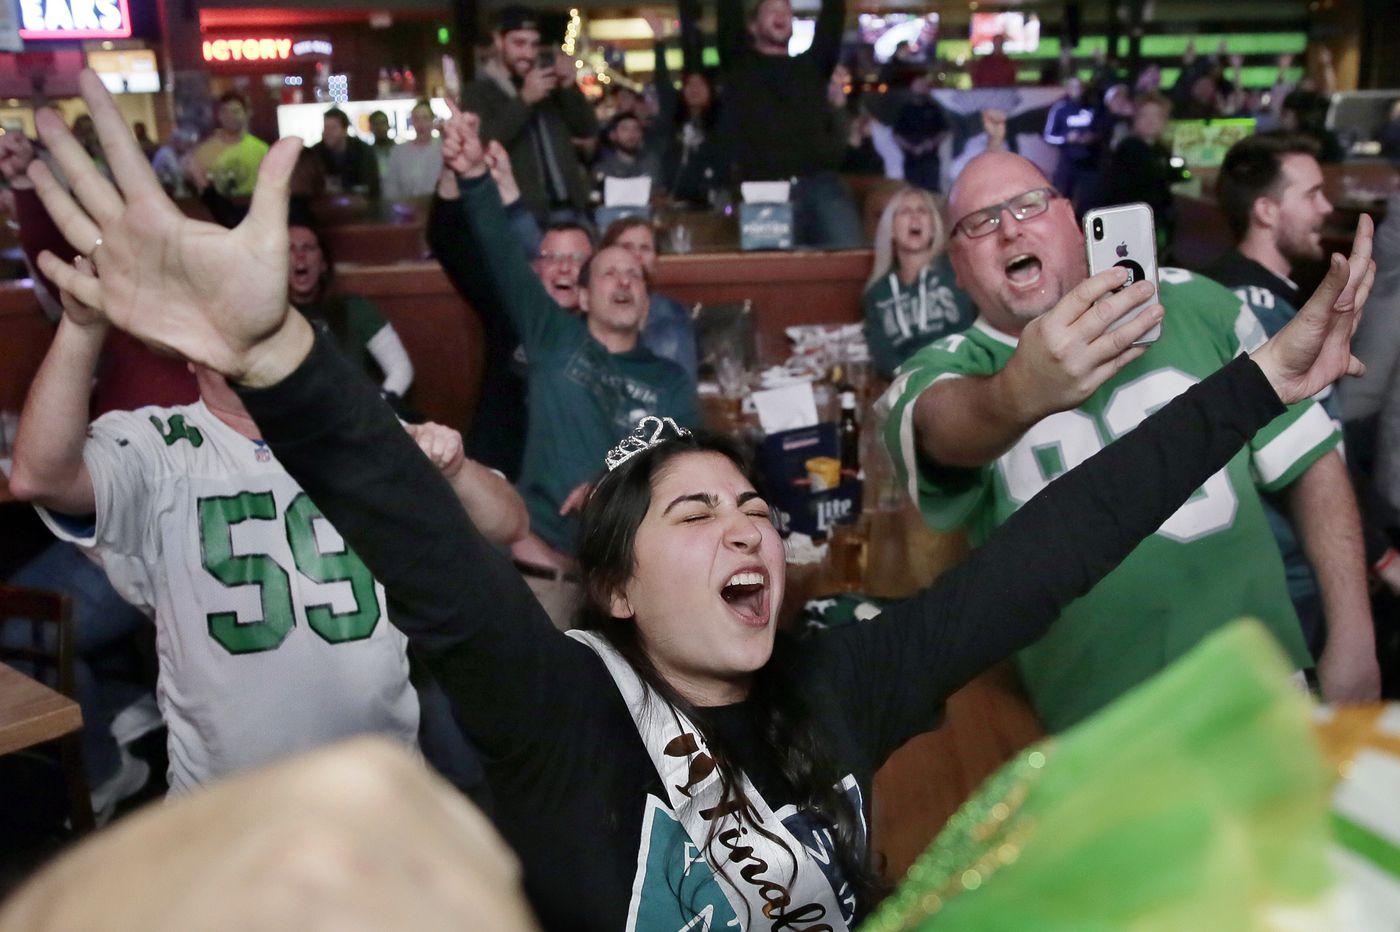 Philadelphia's week in pictures: December 17, 2018